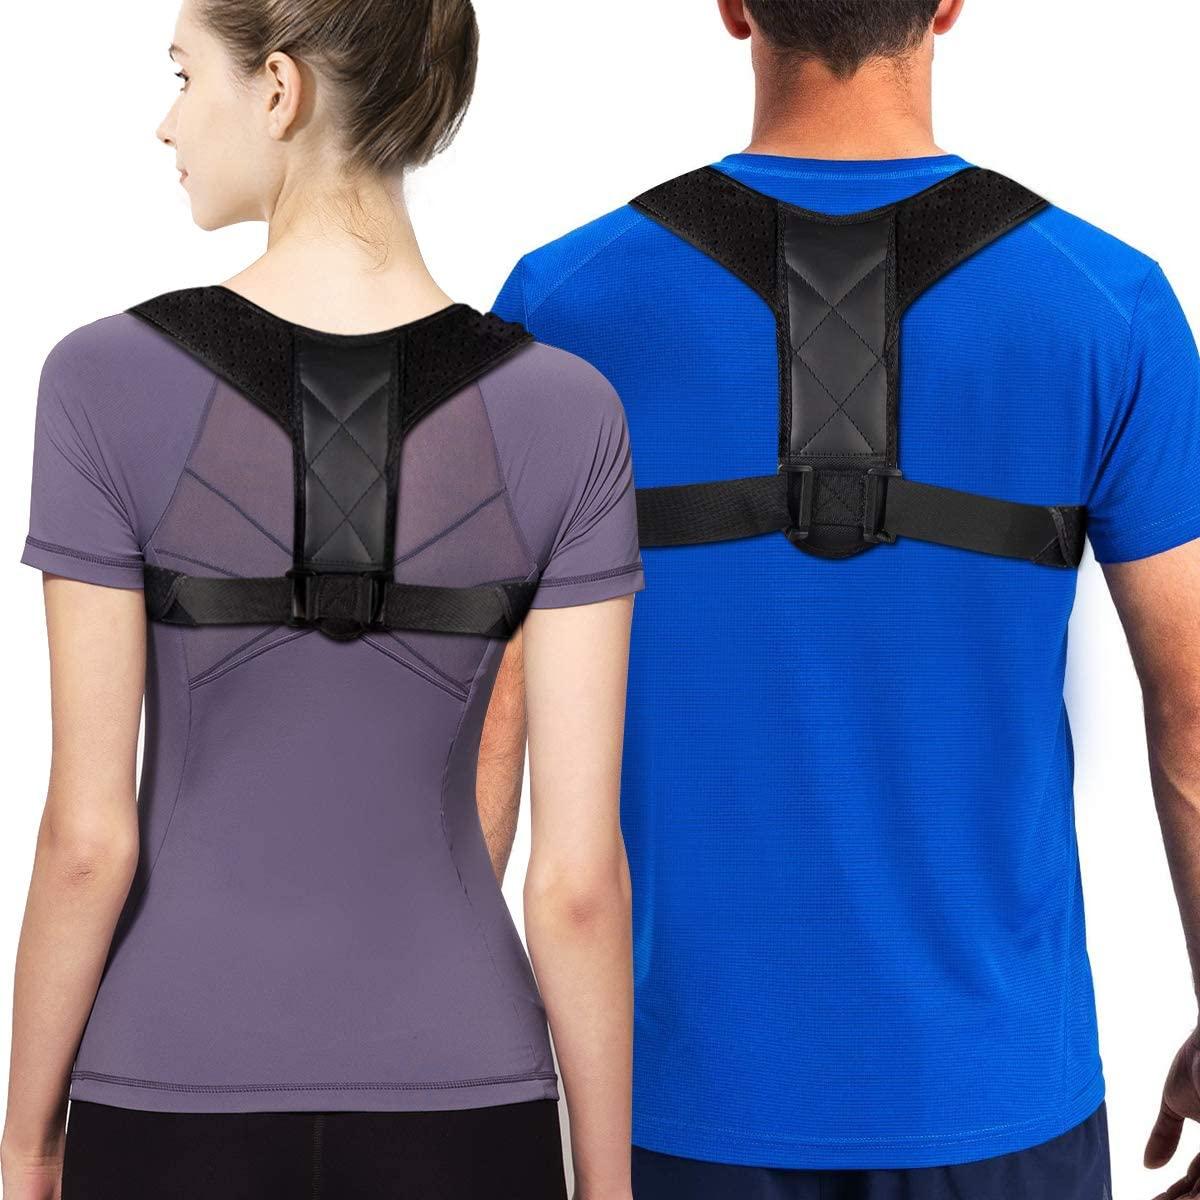 GTETKDE Back Posture Corrector for Men Posture Support Brace for Women Providing Pain Relief from Neck, Back and Shoulder (GT002)